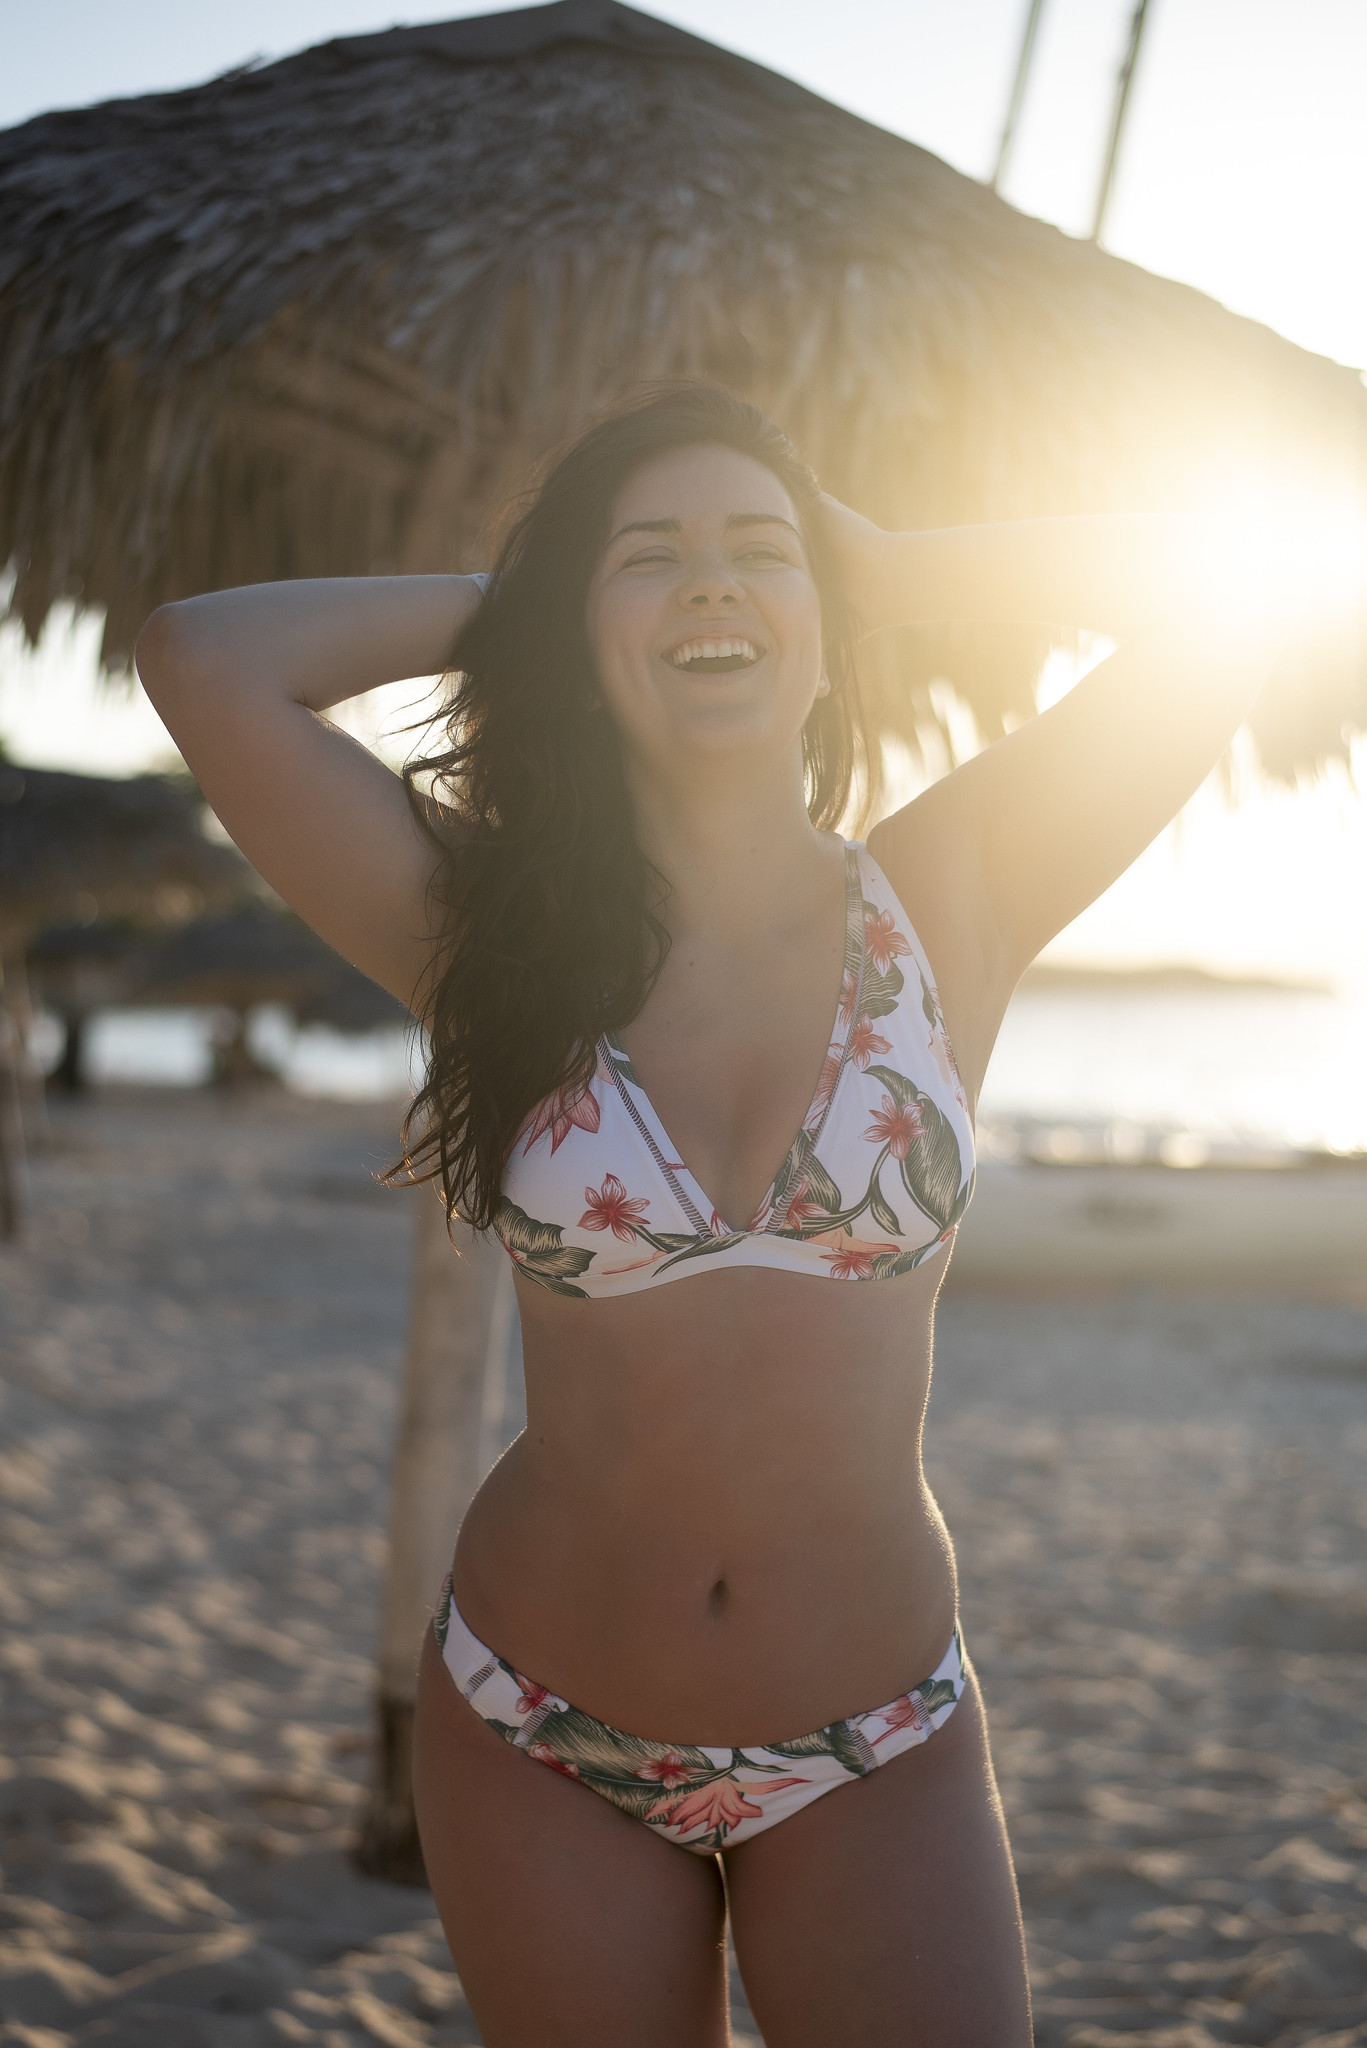 marie-chloe falardeau bikini village cuba palmier coucher de soleil